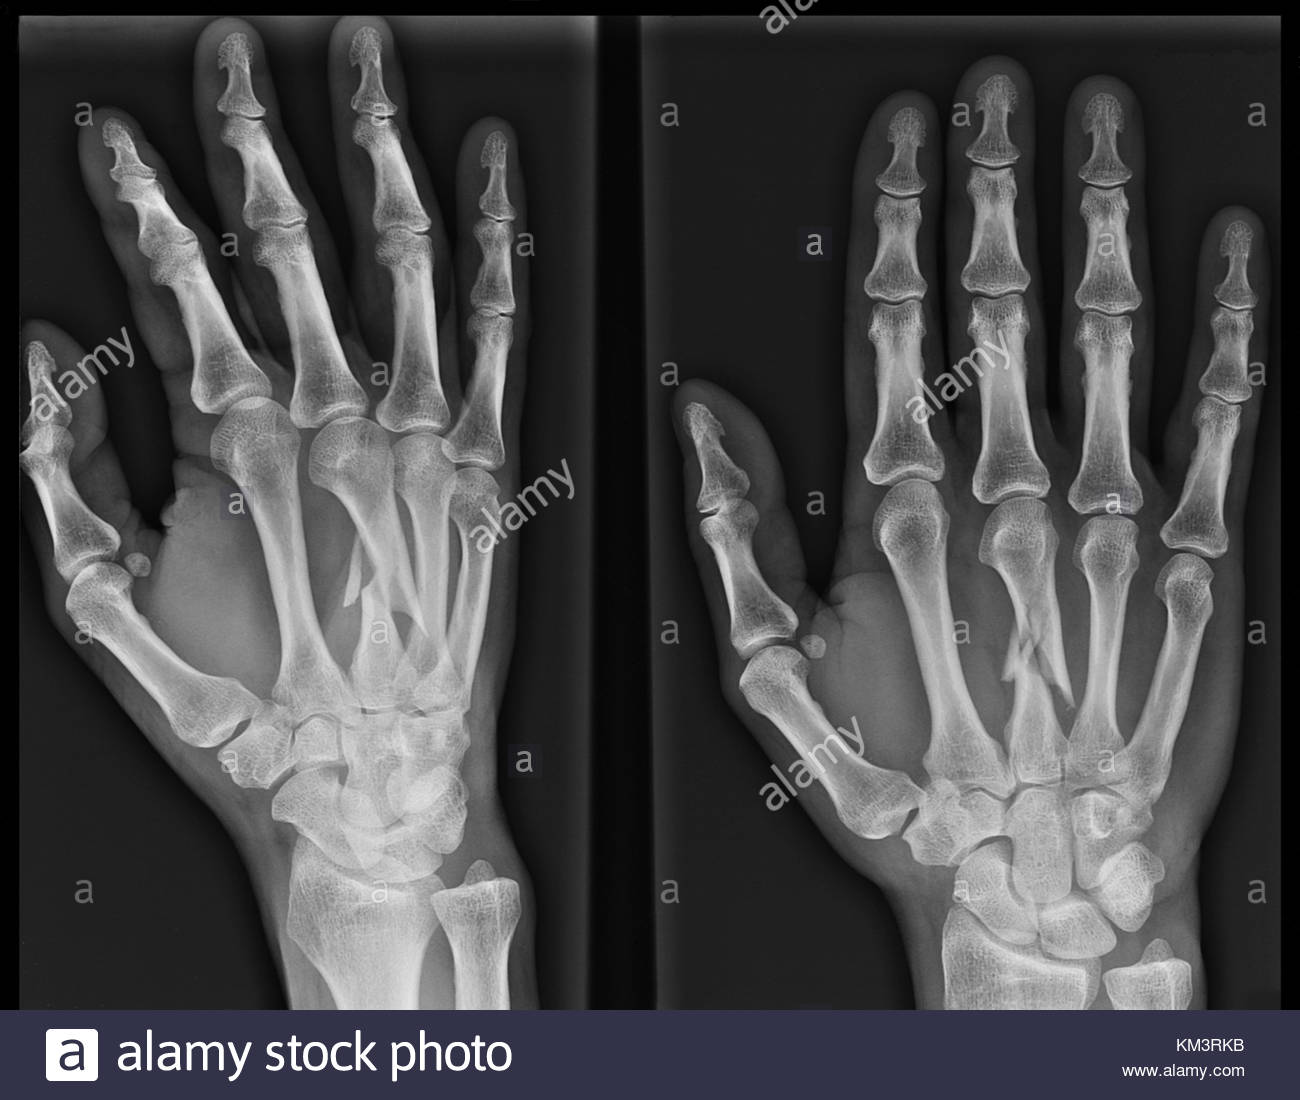 X Ray Image Of The Broken Third Metacarpal Bone In The Hand Stock